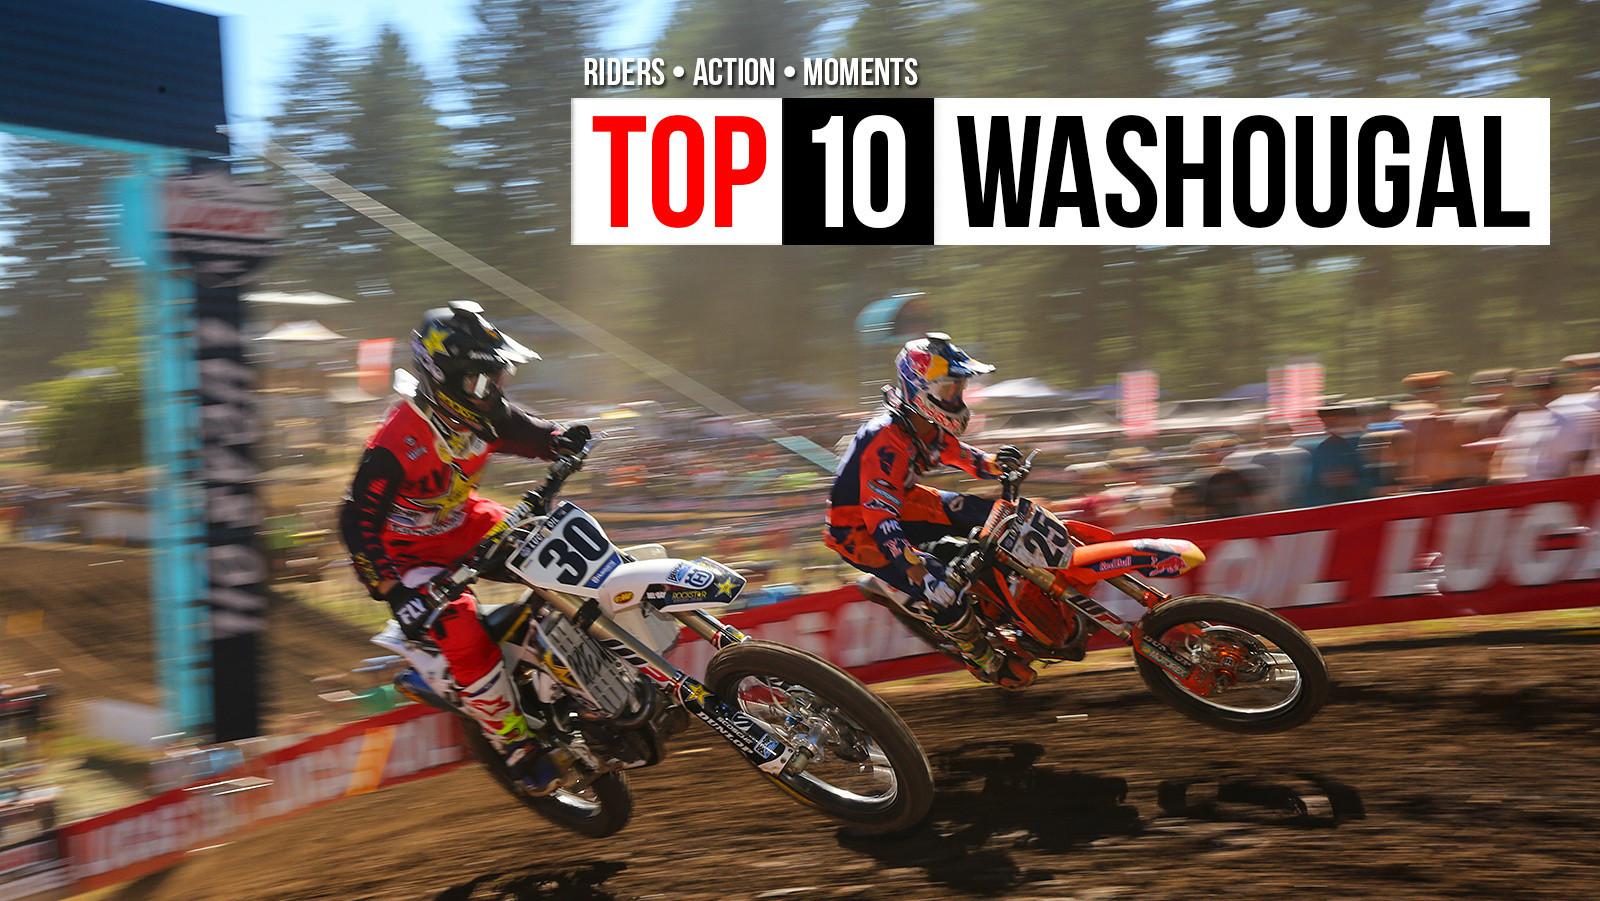 Top 10: Washougal